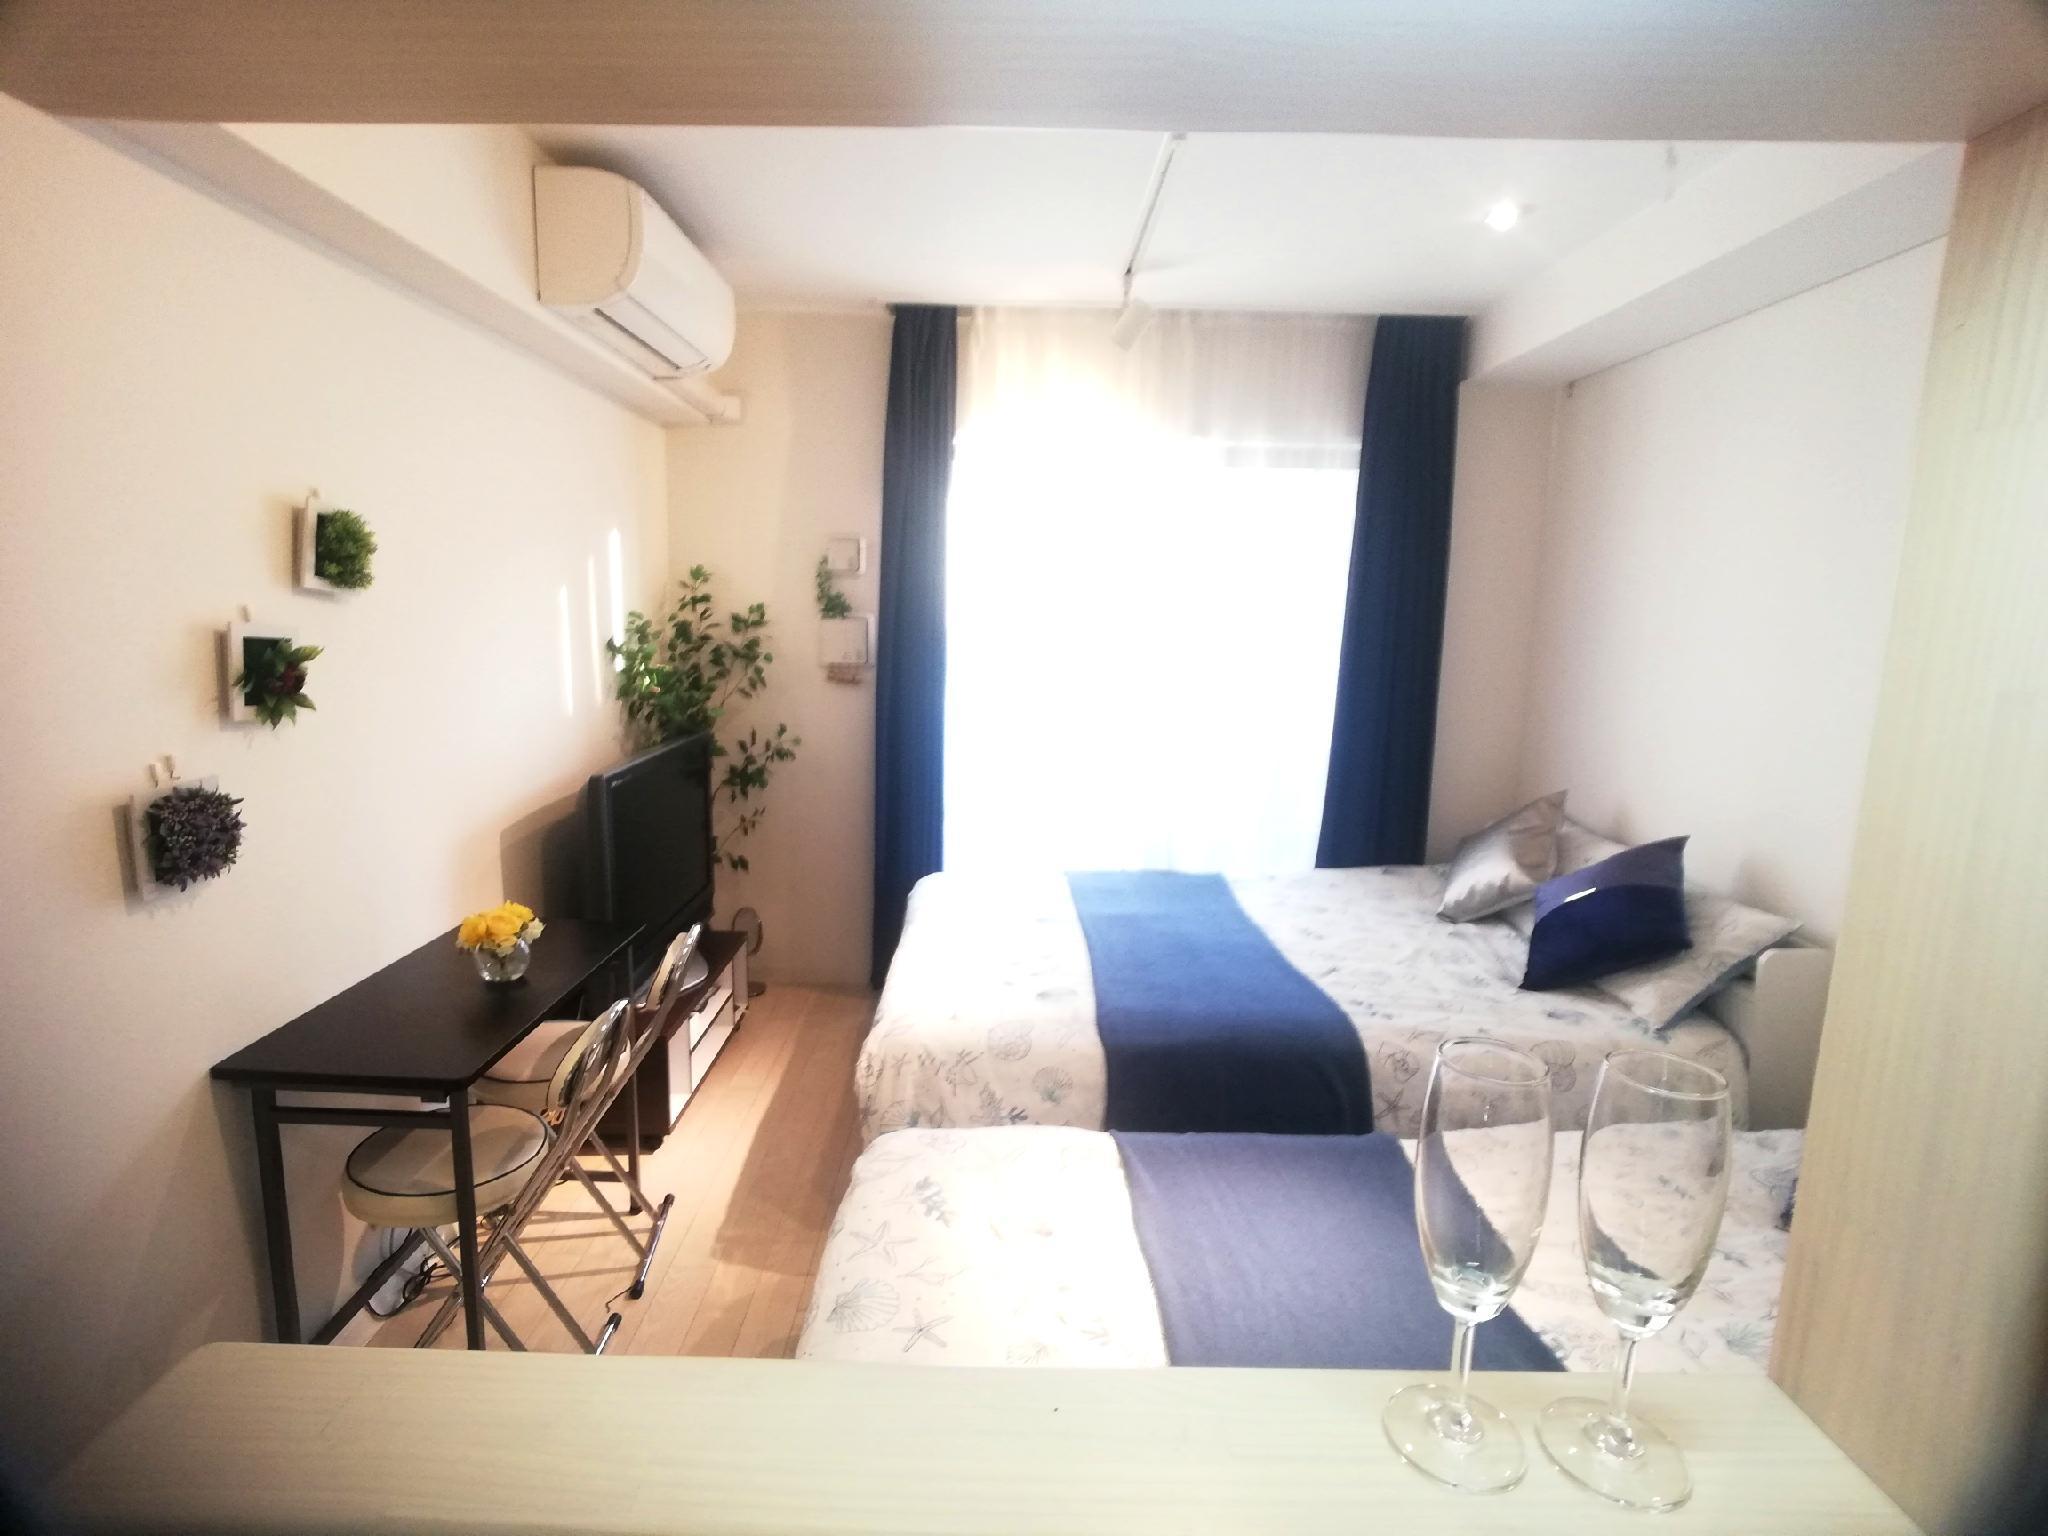 102 NEW OPEN New House 8min To Ikebukuro STa 4PPL